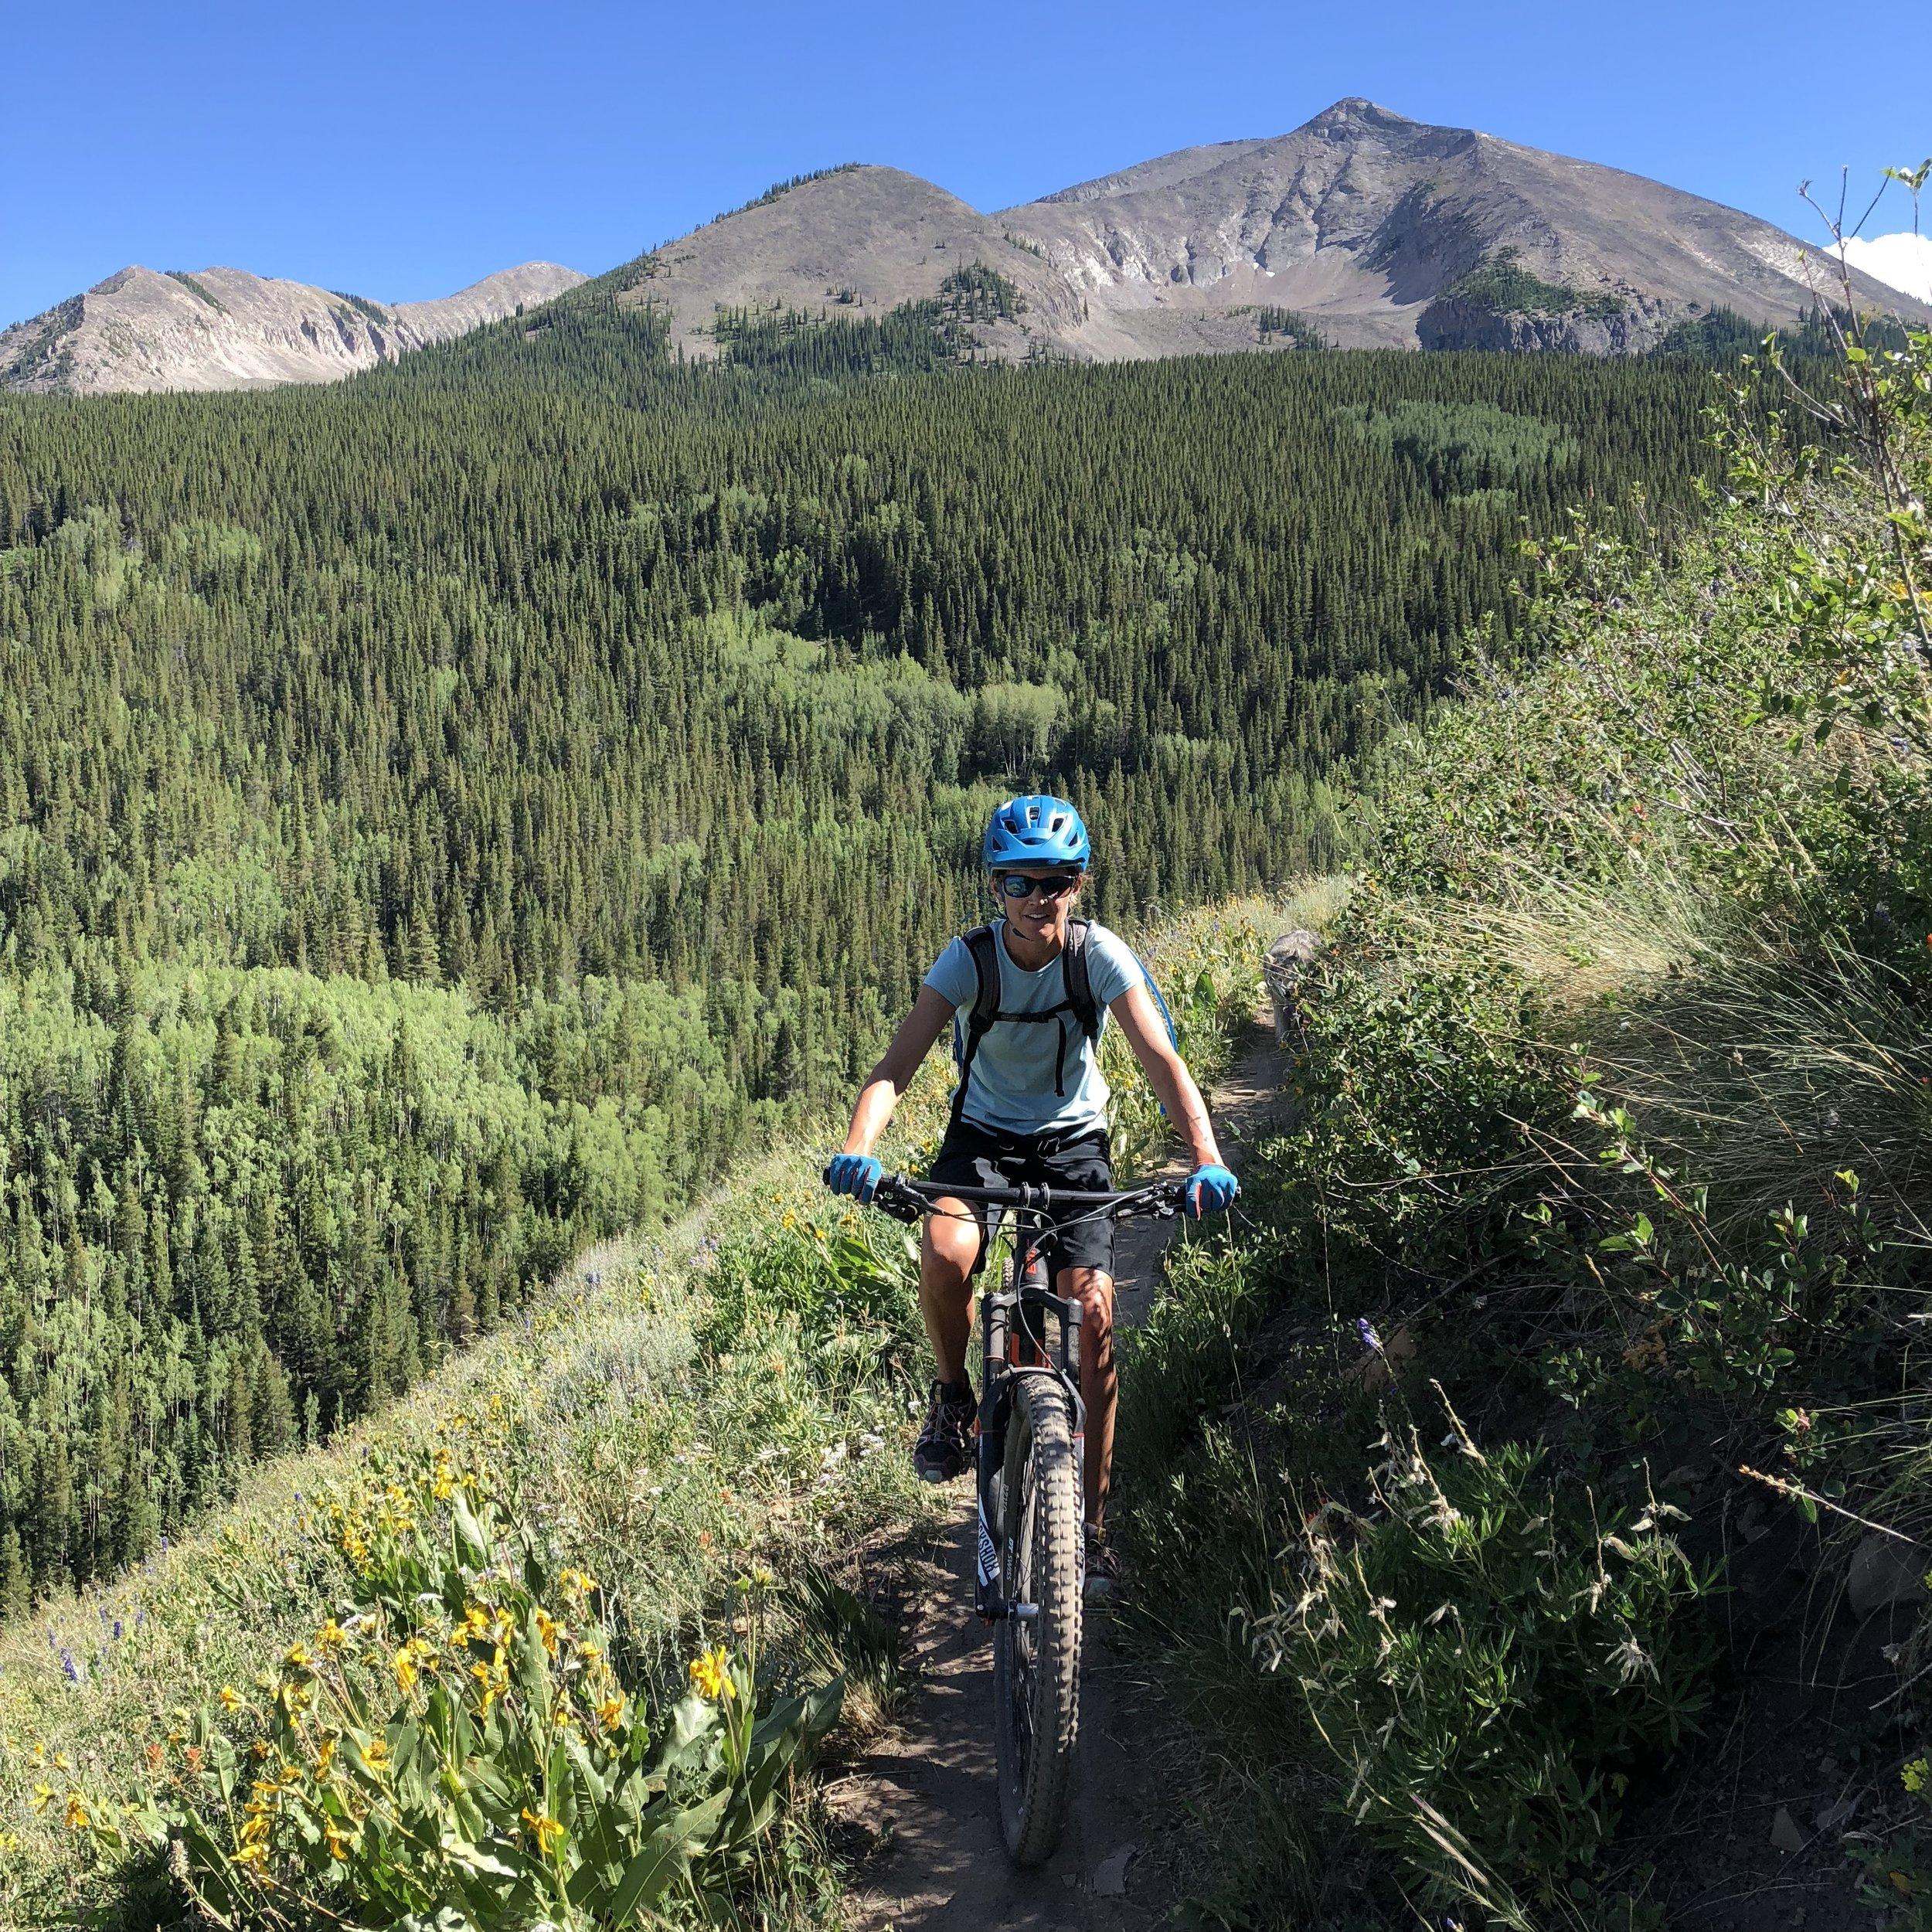 kristin gym cb south fitness mountain biking.jpg